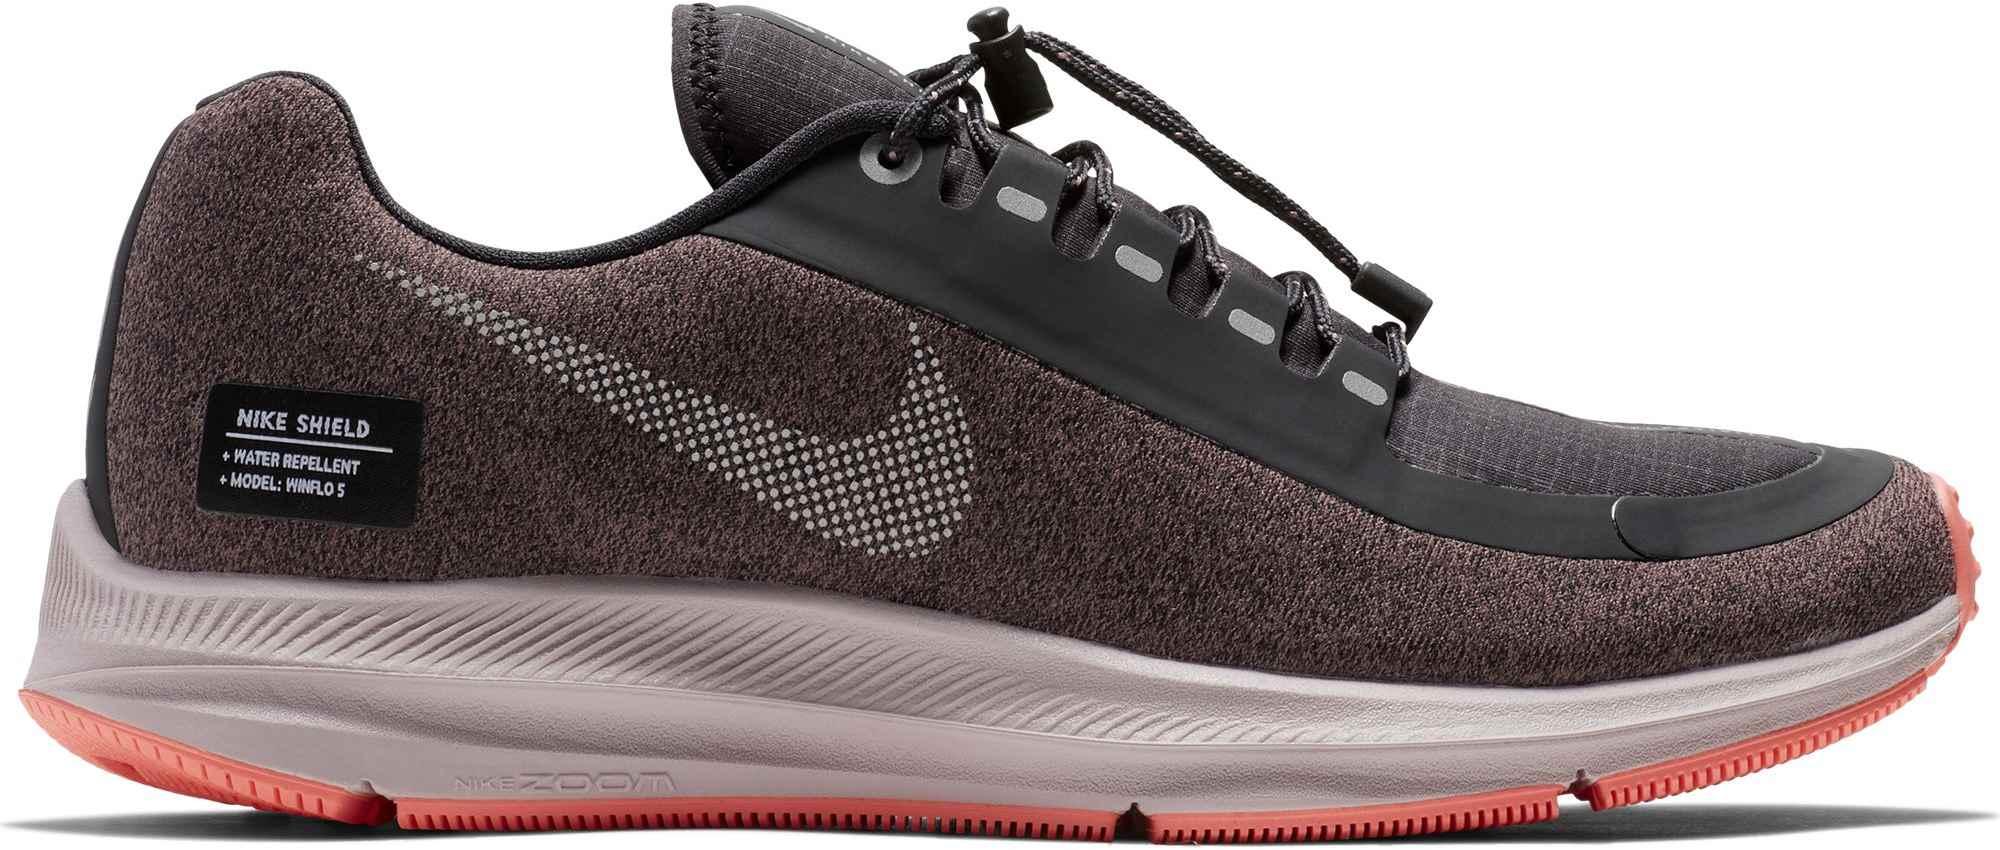 size 40 837b2 1b7d2 Nike AIR ZOOM WINFLO 5 RUN SHIELD W | sportisimo.cz